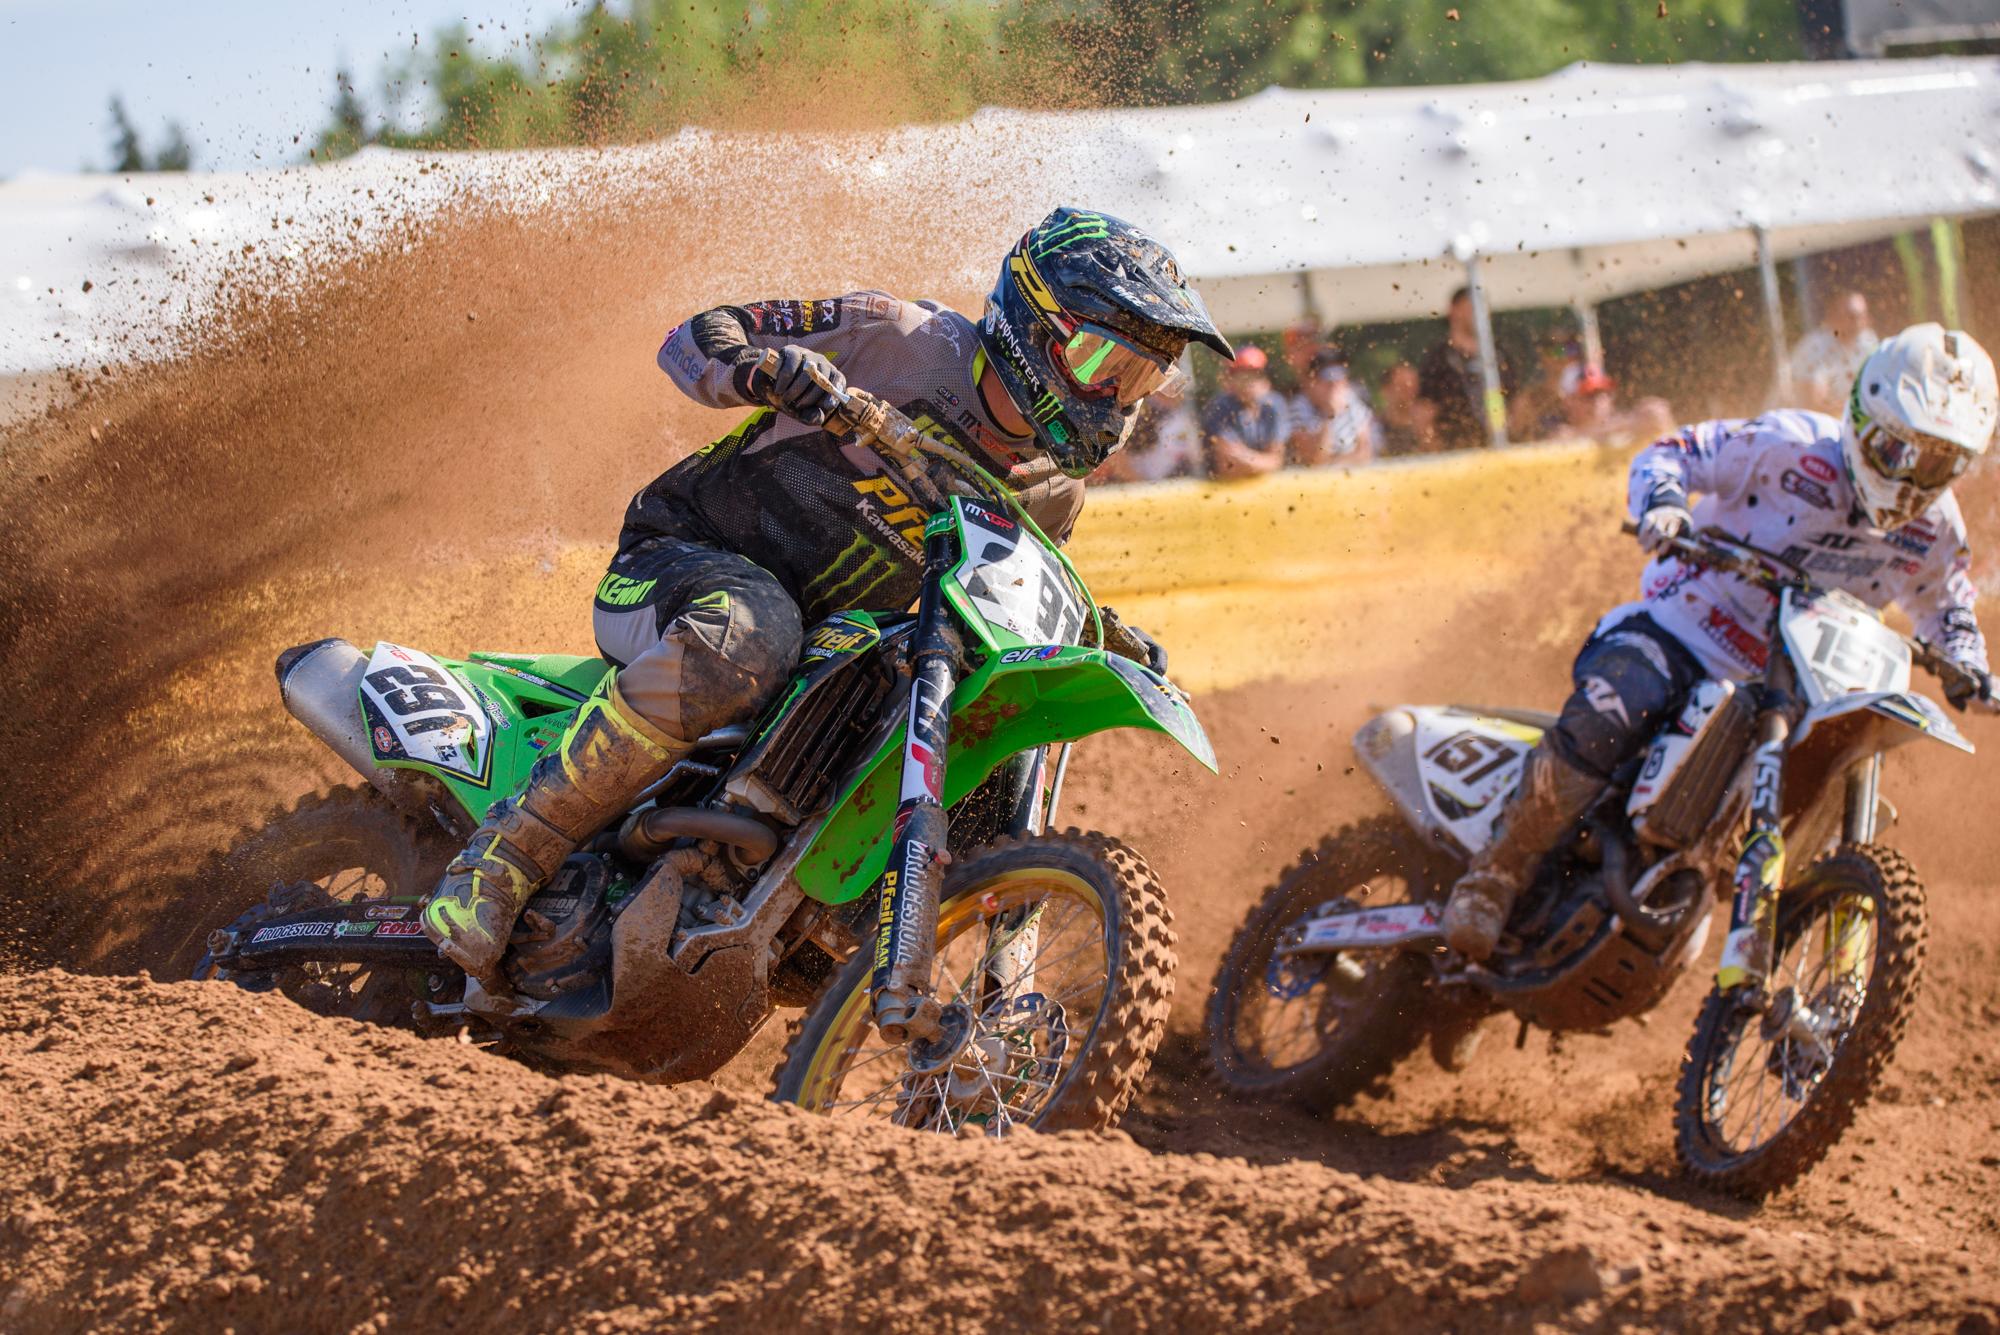 13.05.2018. KEGUMS, LATVIA. FIM MXGP Motocross World Championship Grand Prix of Latvia.